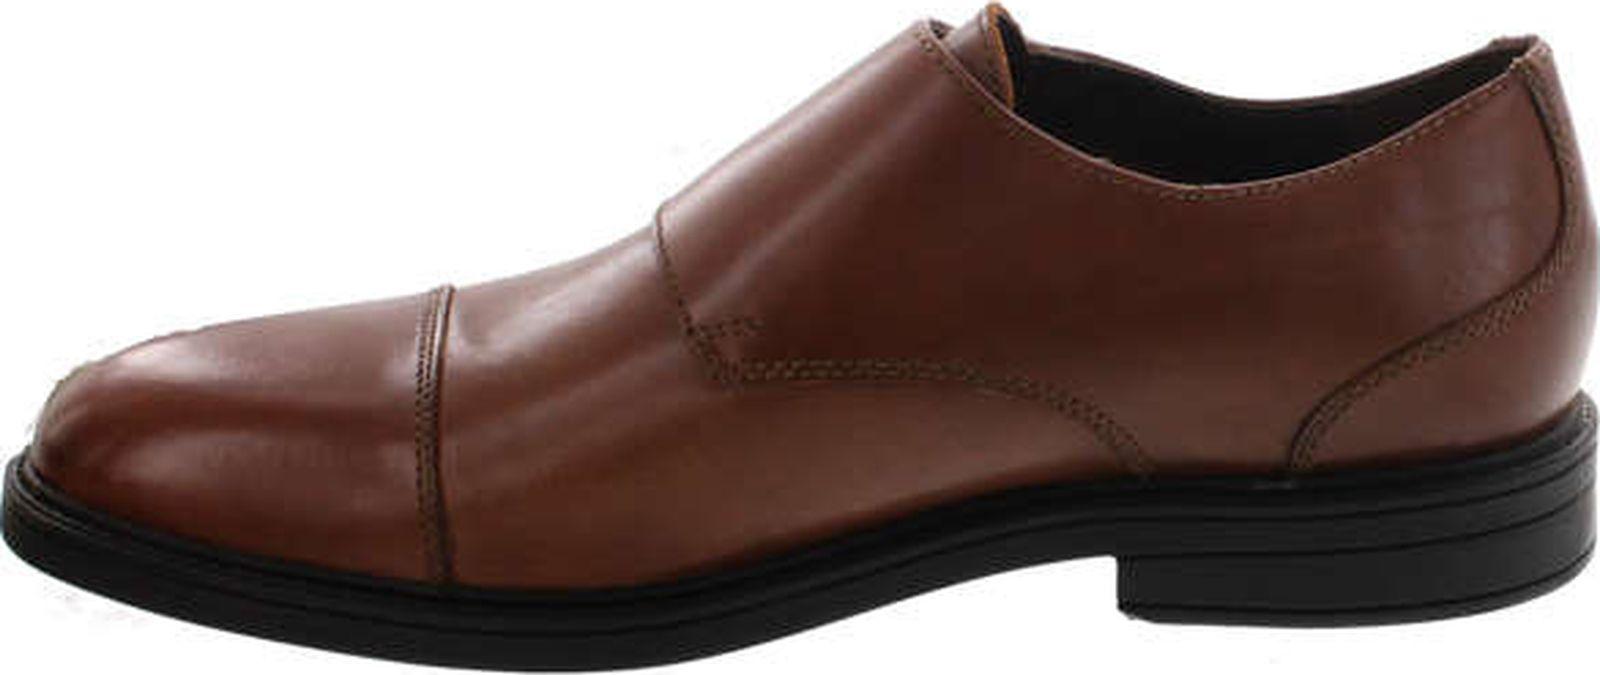 Bostonian Men/'s Cordis Style Tan Leather Dress Shoes 26130060